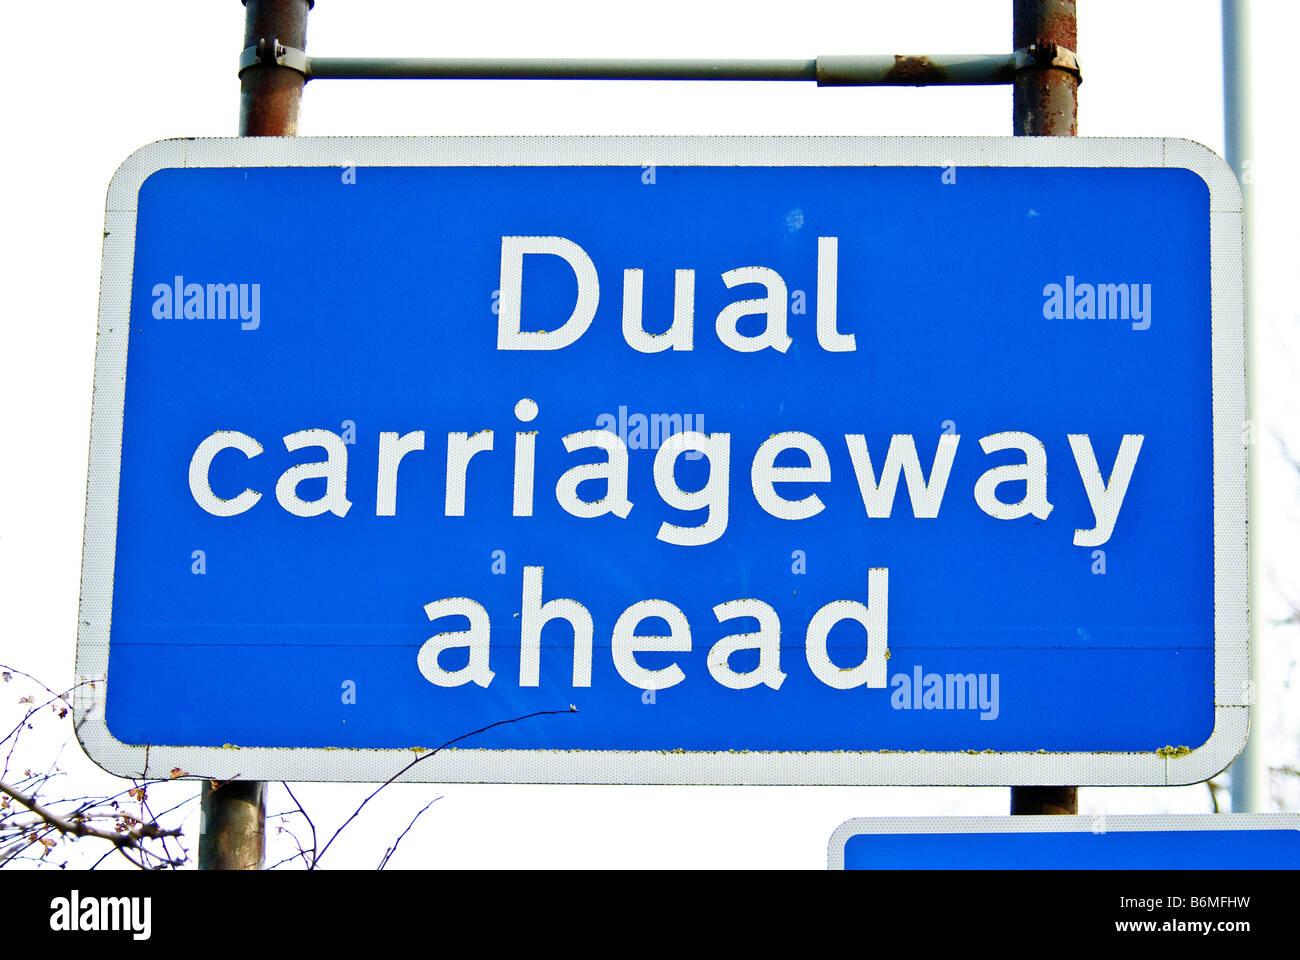 Dual carriageway road sign - Stock Image